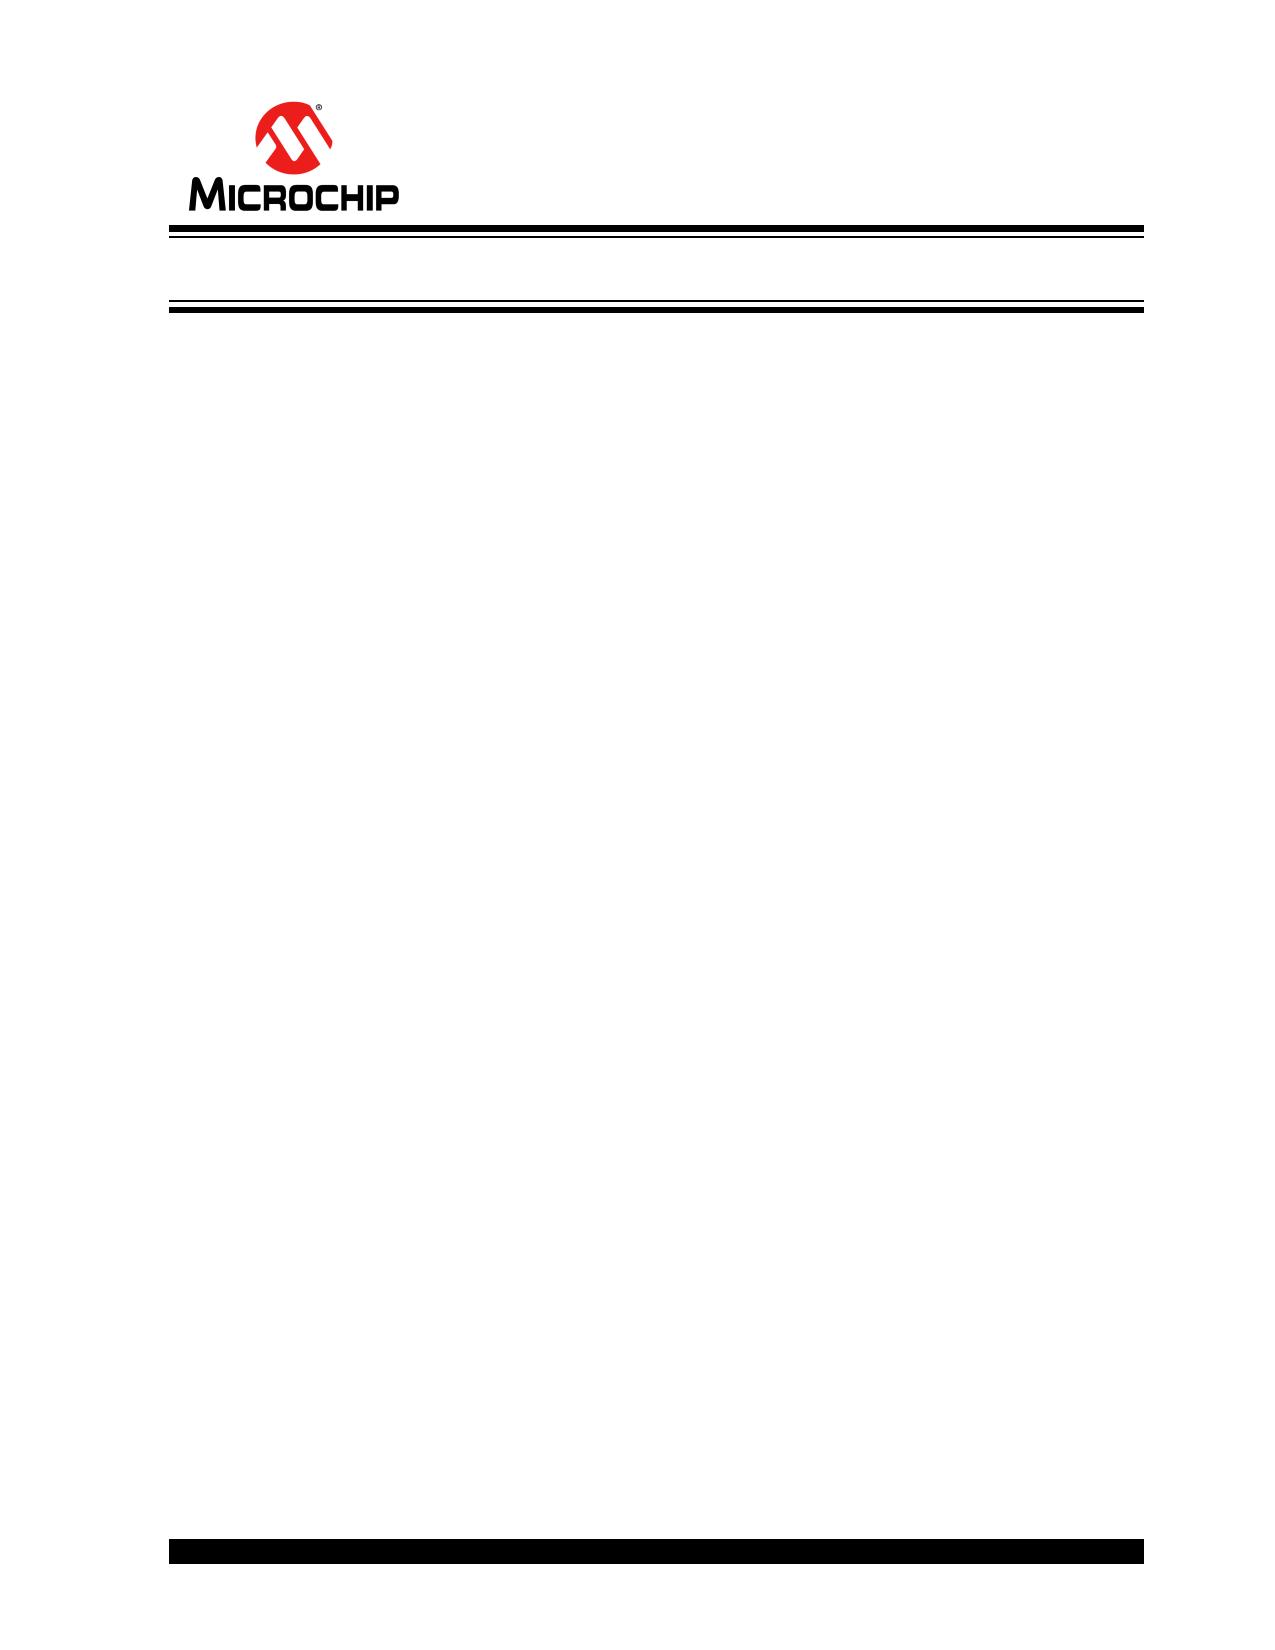 PIC12F1501 데이터시트 및 PIC12F1501 PDF